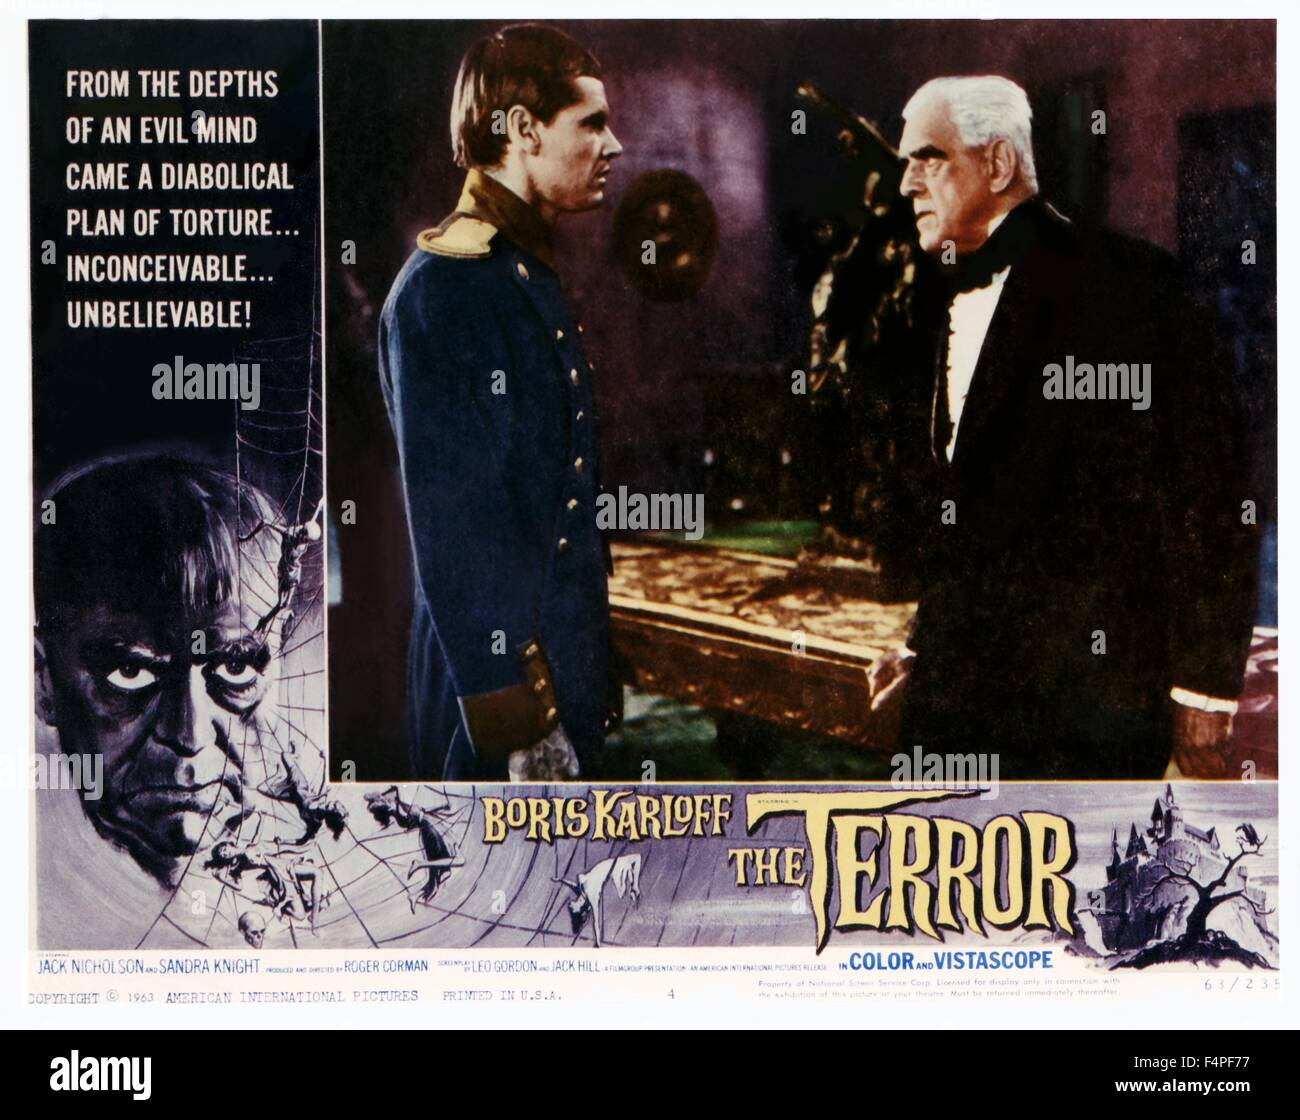 Jack Nicholson and Boris Karloff / The Terror / 1963 directed by Roger Corman - Stock Image